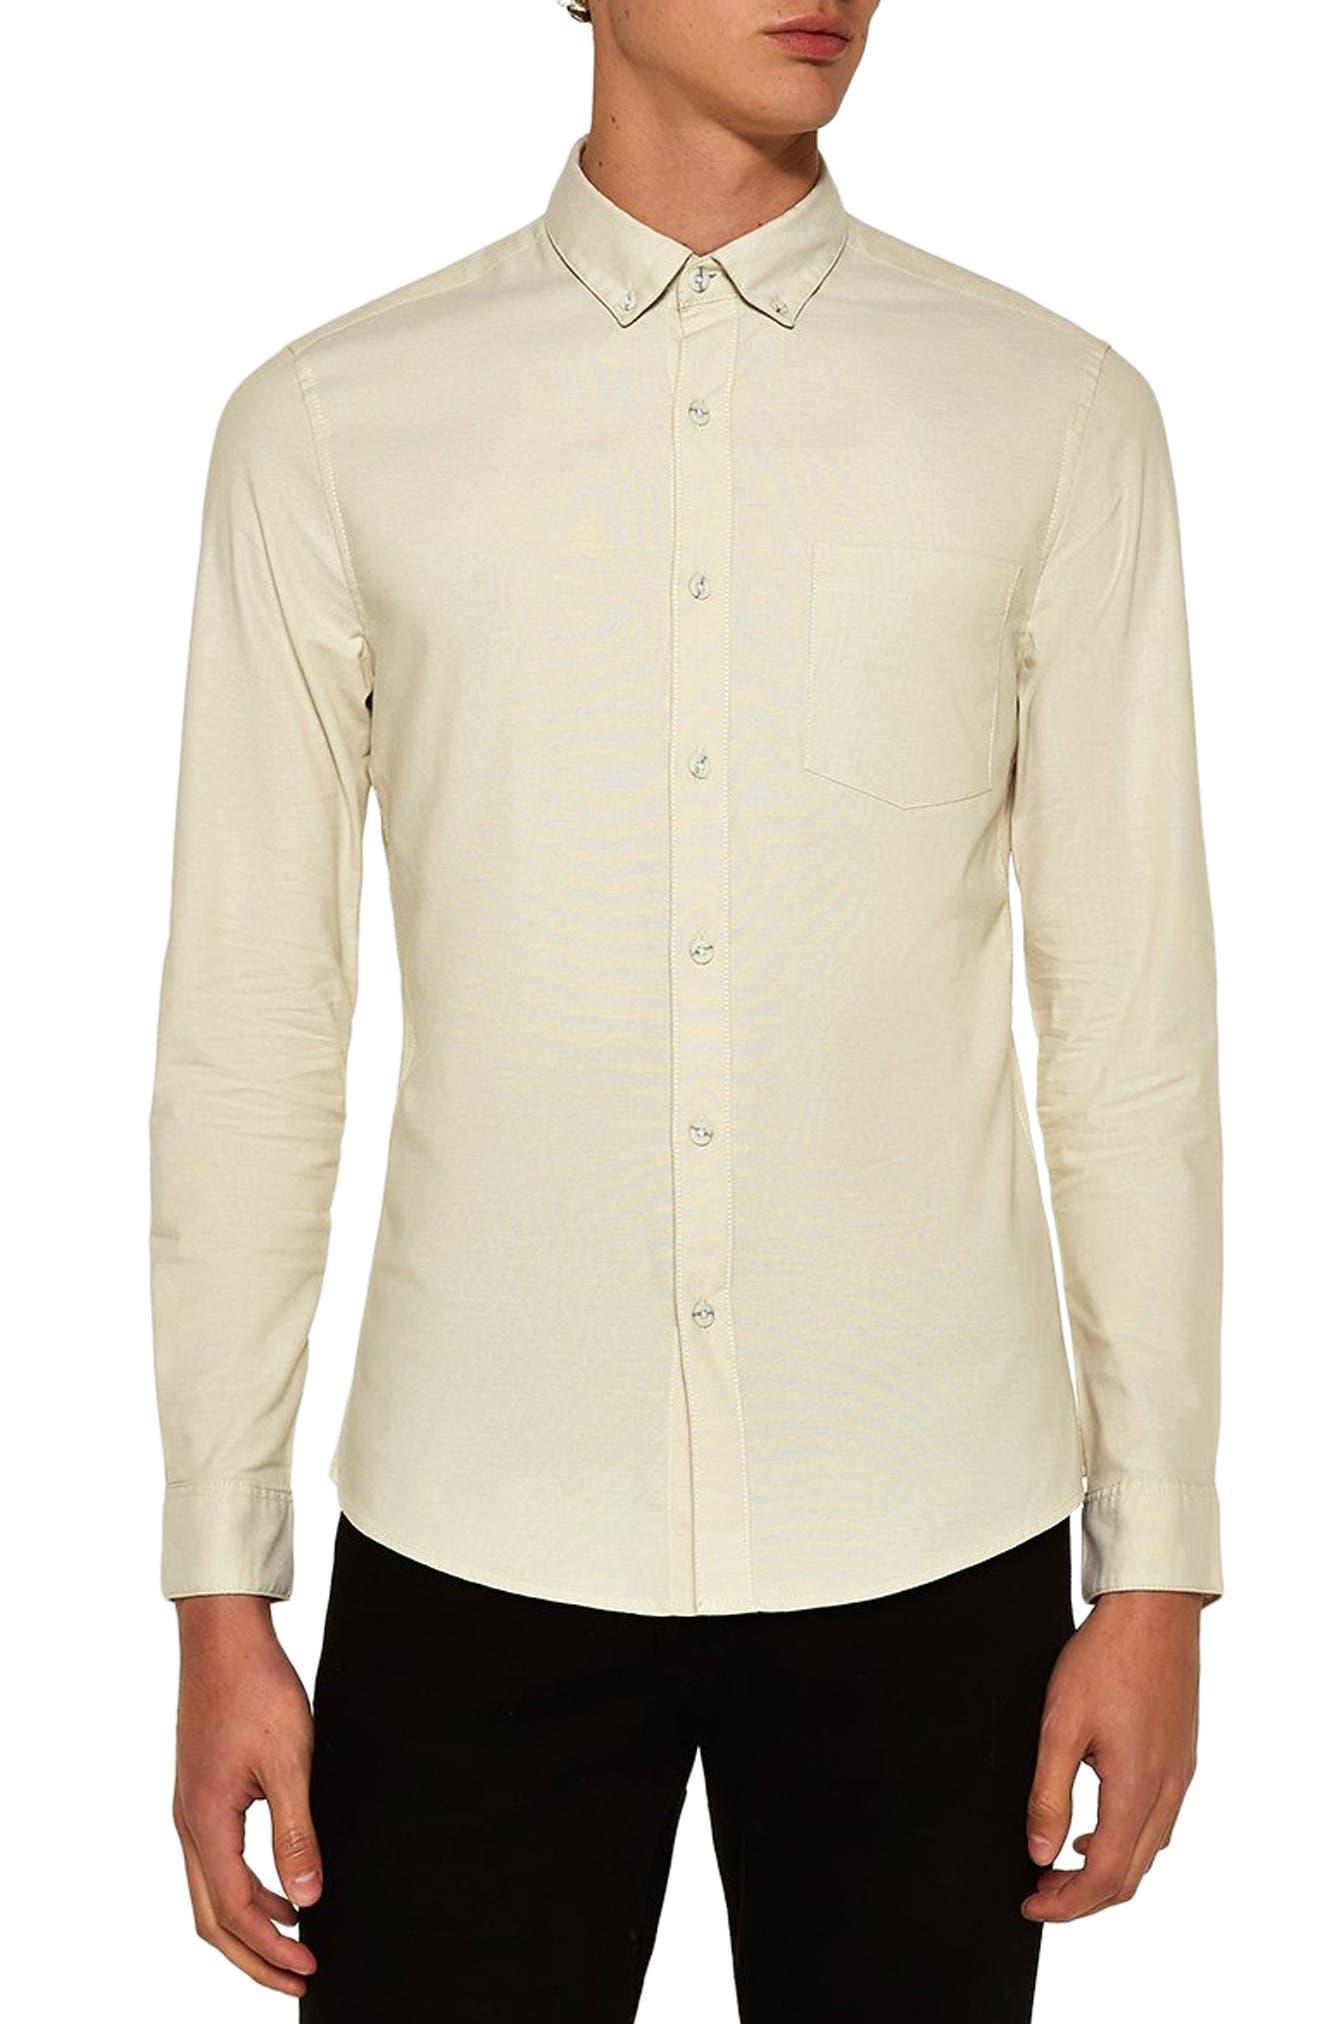 TOPMAN,                             Muscle Fit Stripe Oxford Shirt,                             Main thumbnail 1, color,                             250